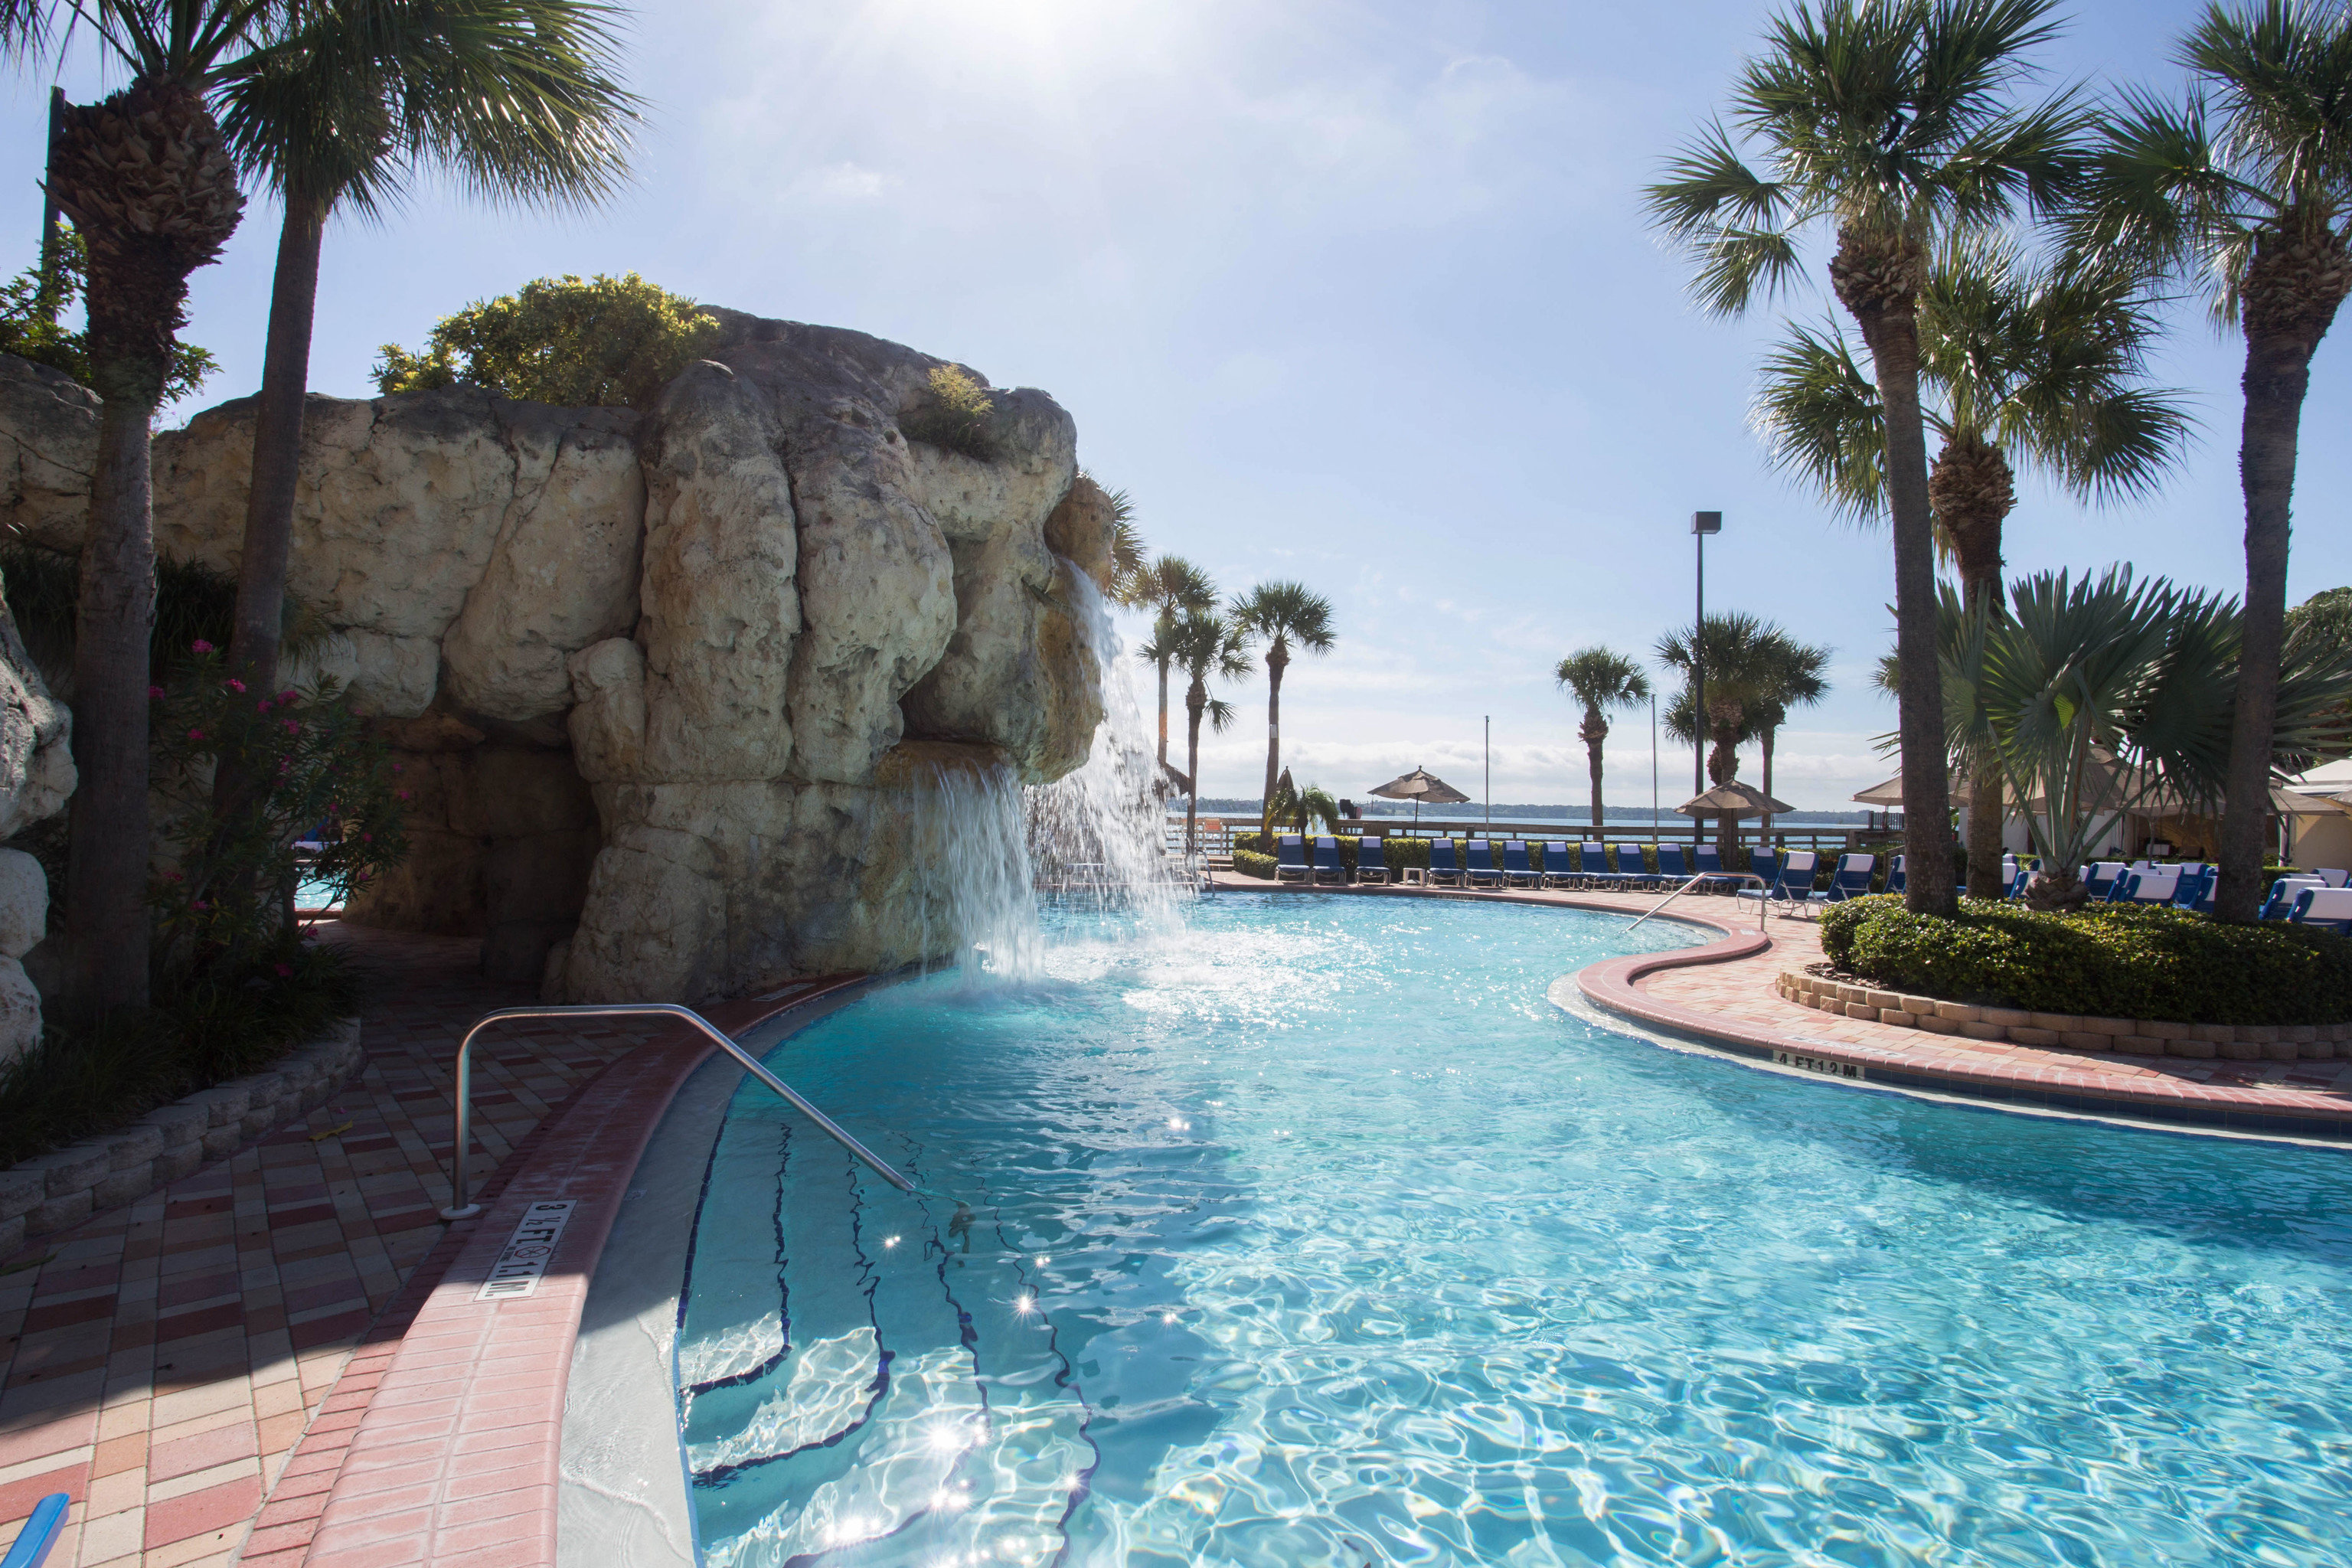 tree sky swimming pool property Resort Pool resort town Villa Water park palm plant